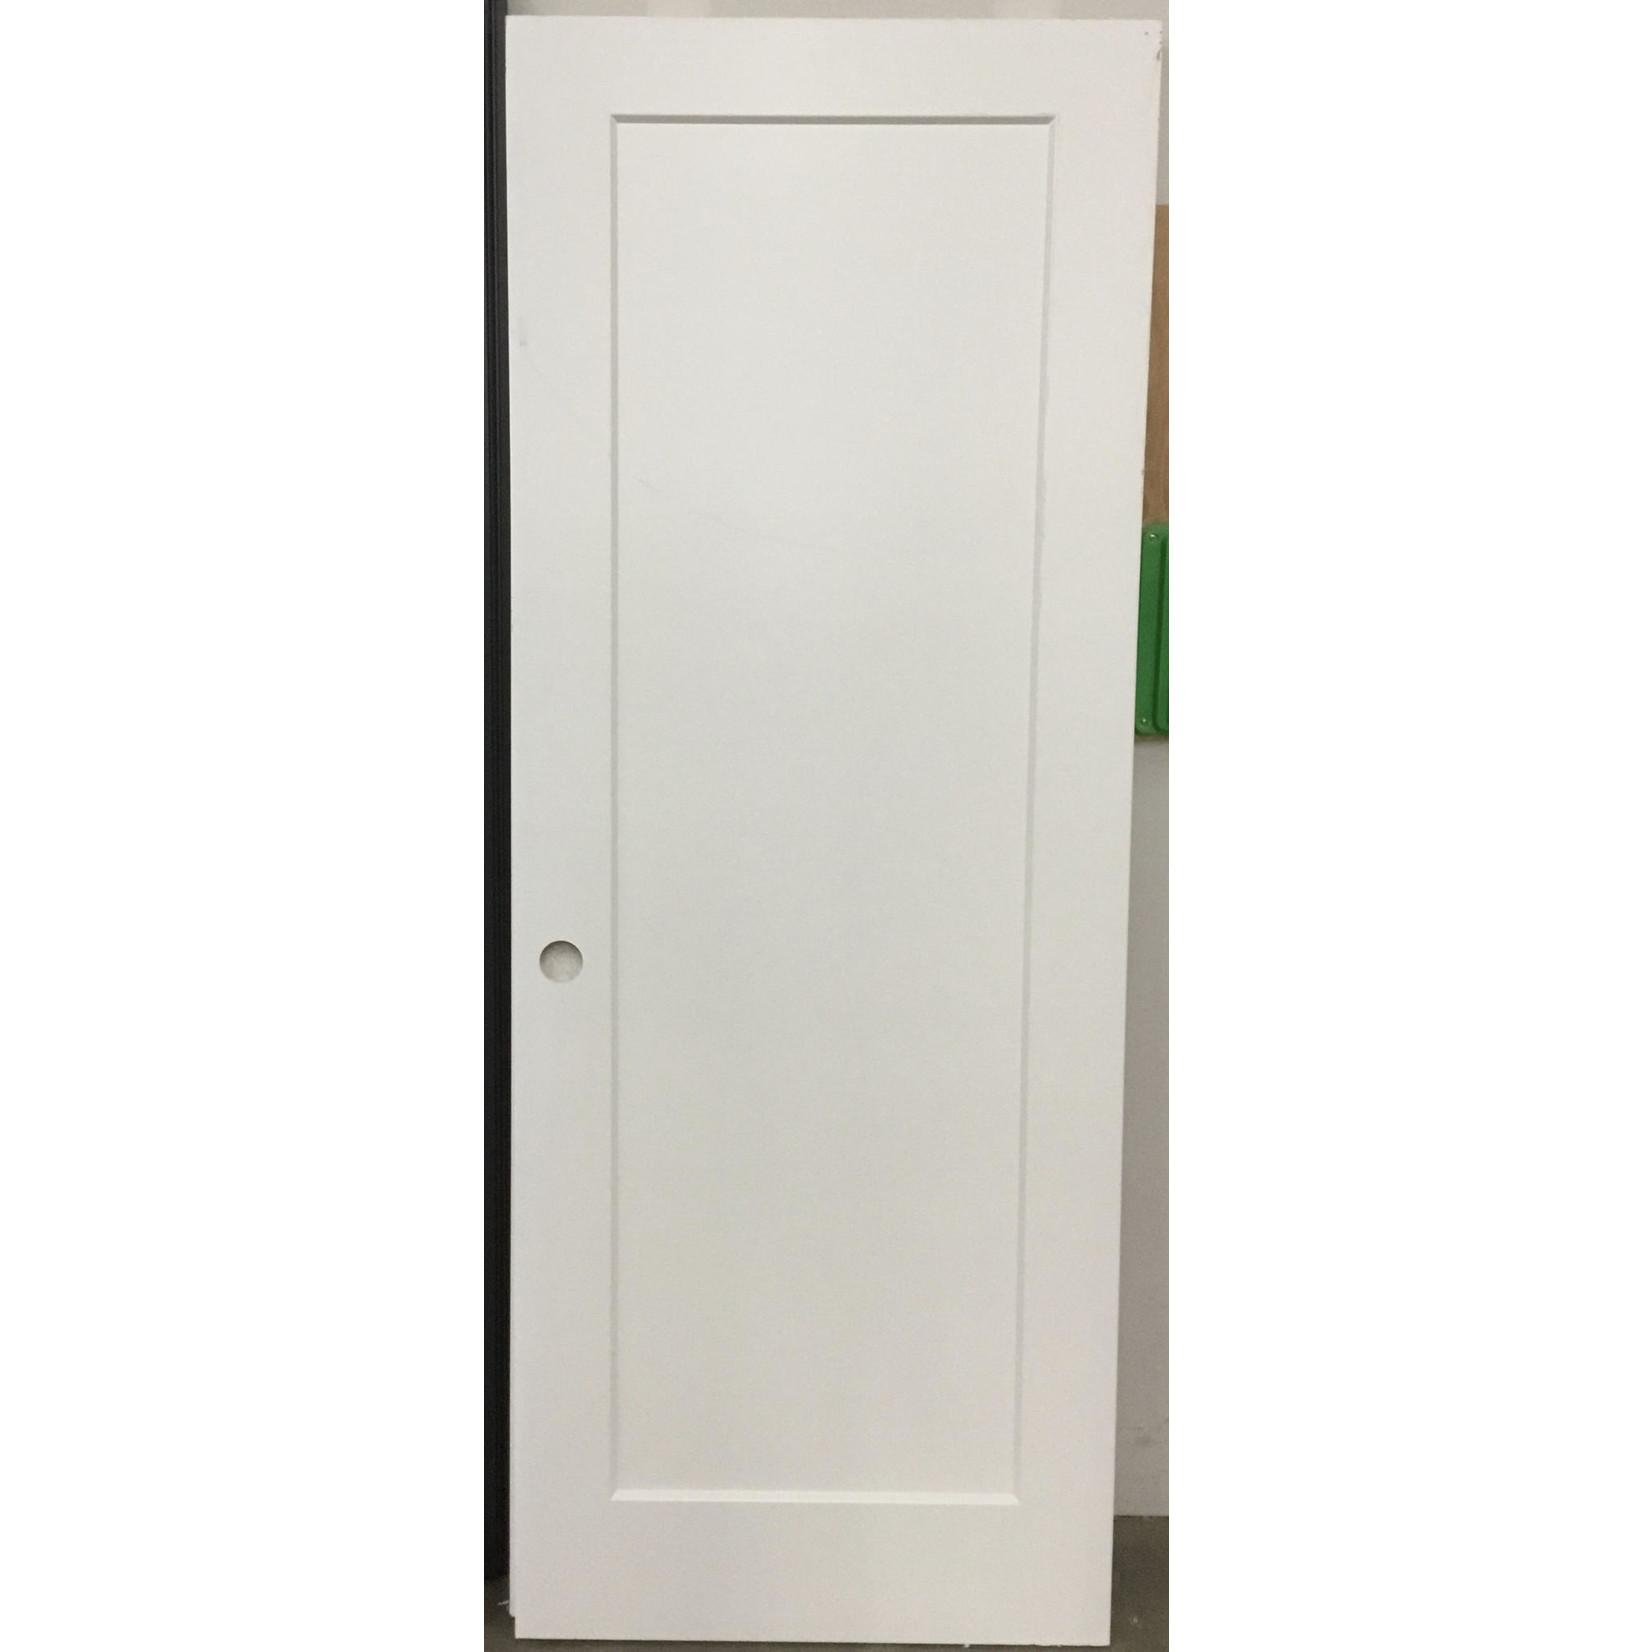 10620 Lightly used Single panel shaker primed door slab